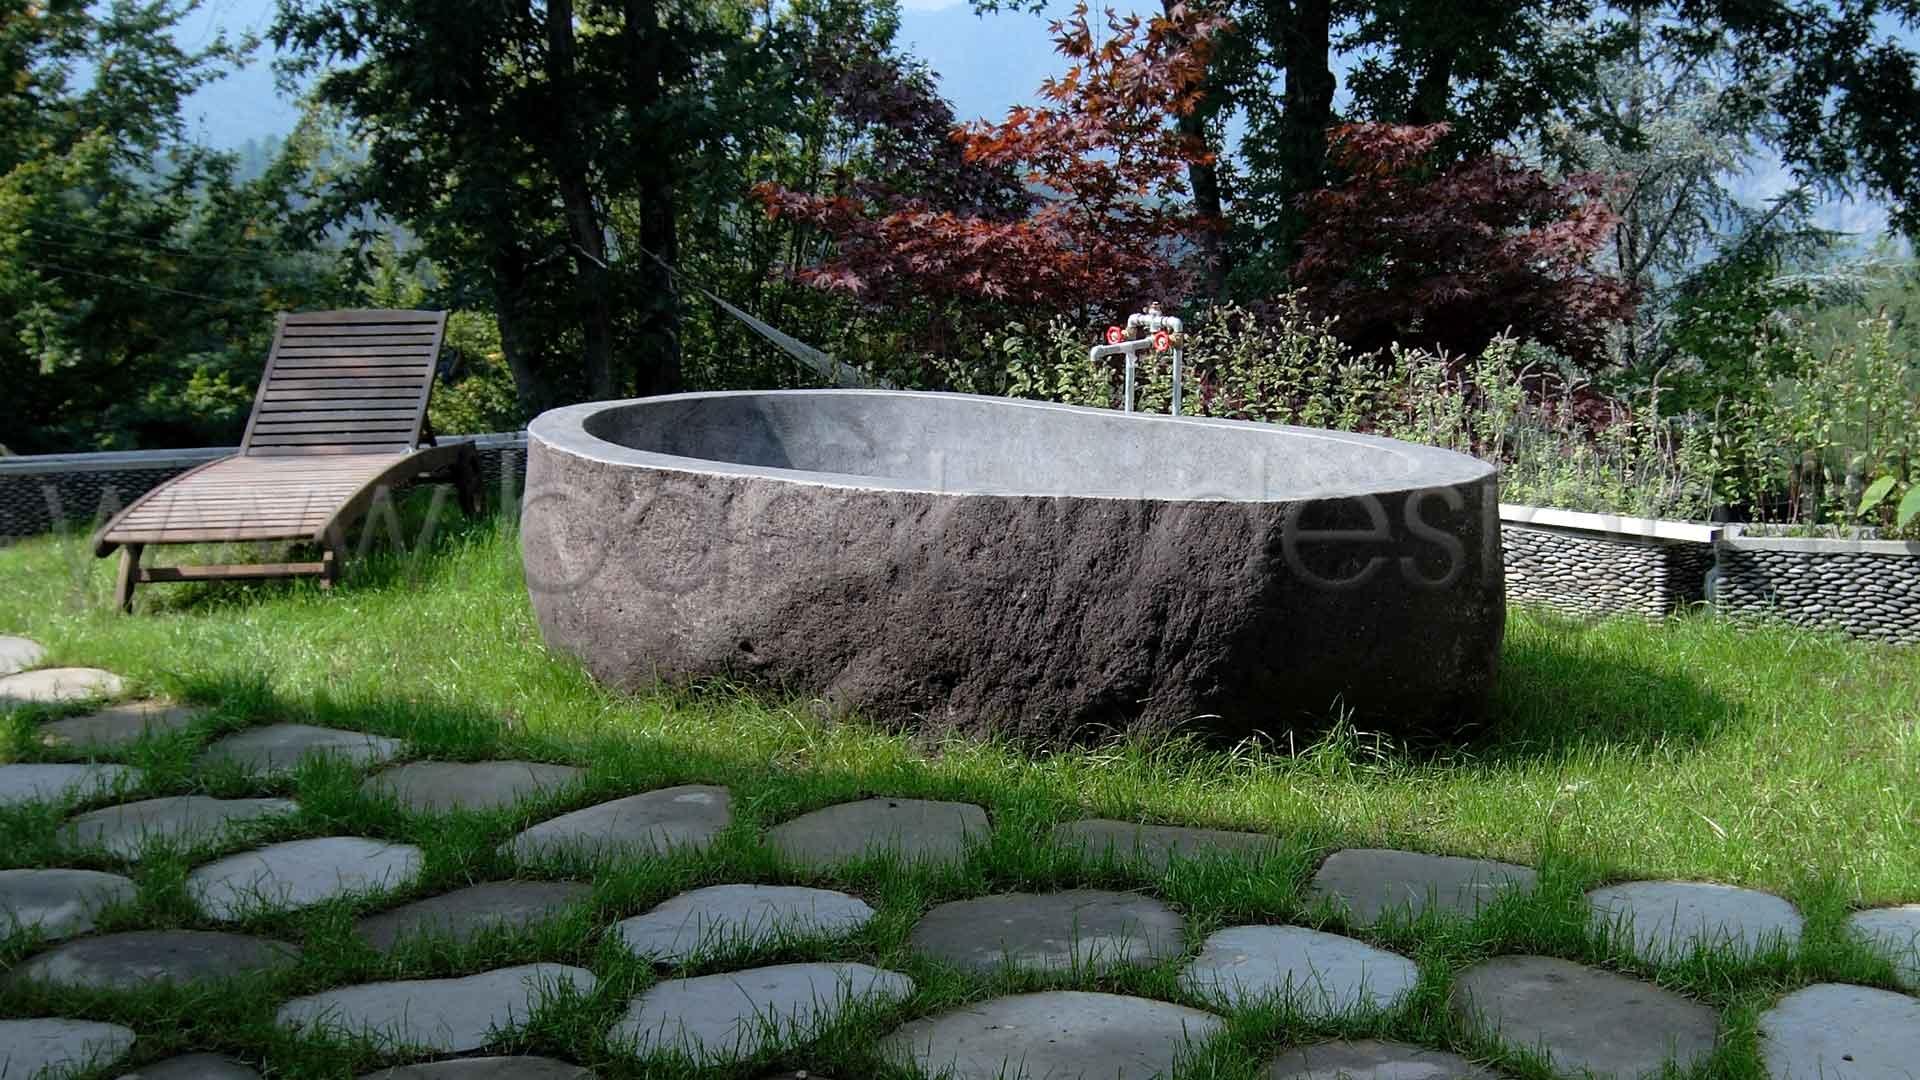 Vasca da bagno riverstone pietra naturale 280x135 bamb - Vasca da bagno in pietra ...